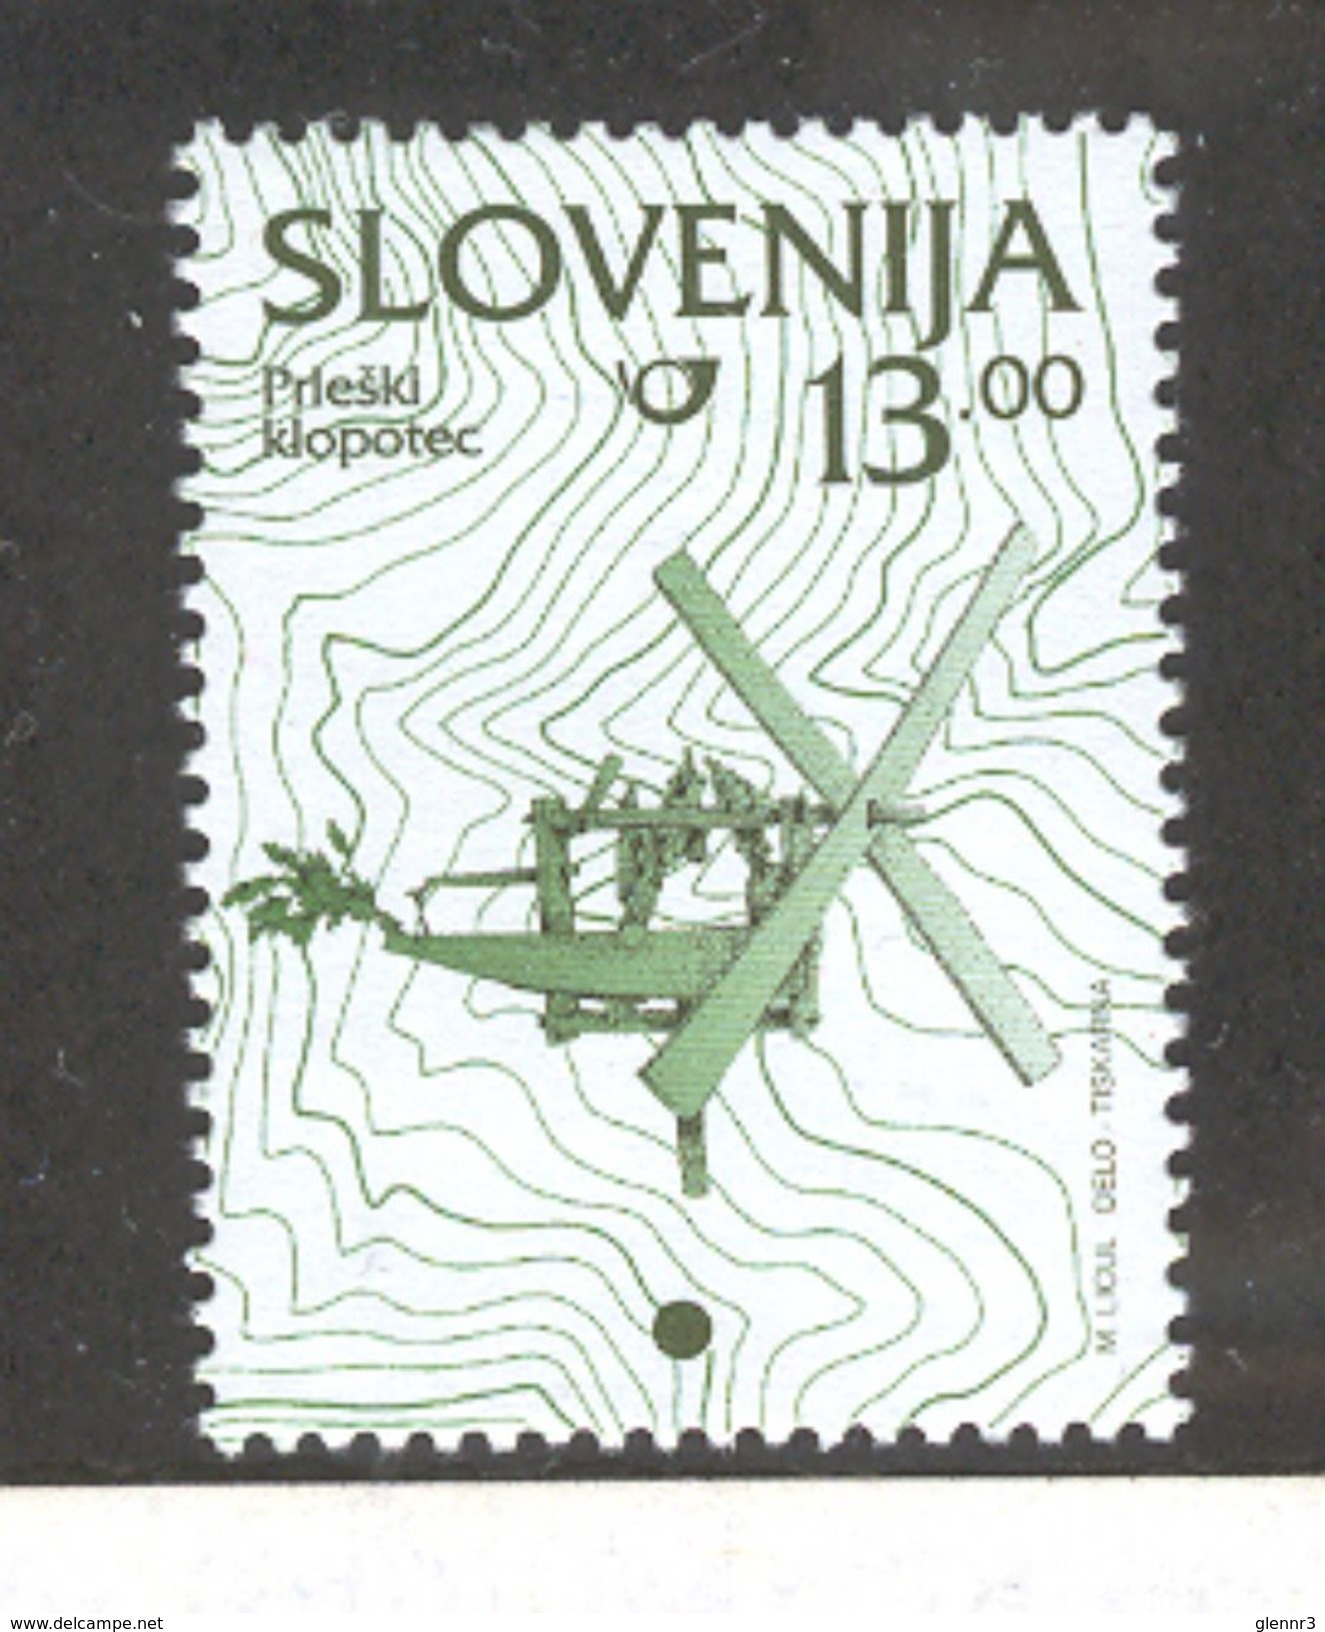 SLOVENIA 1997 Wind Rattle 13t Definitive, Scott Catalogue No. 208A MNH - Slovenia